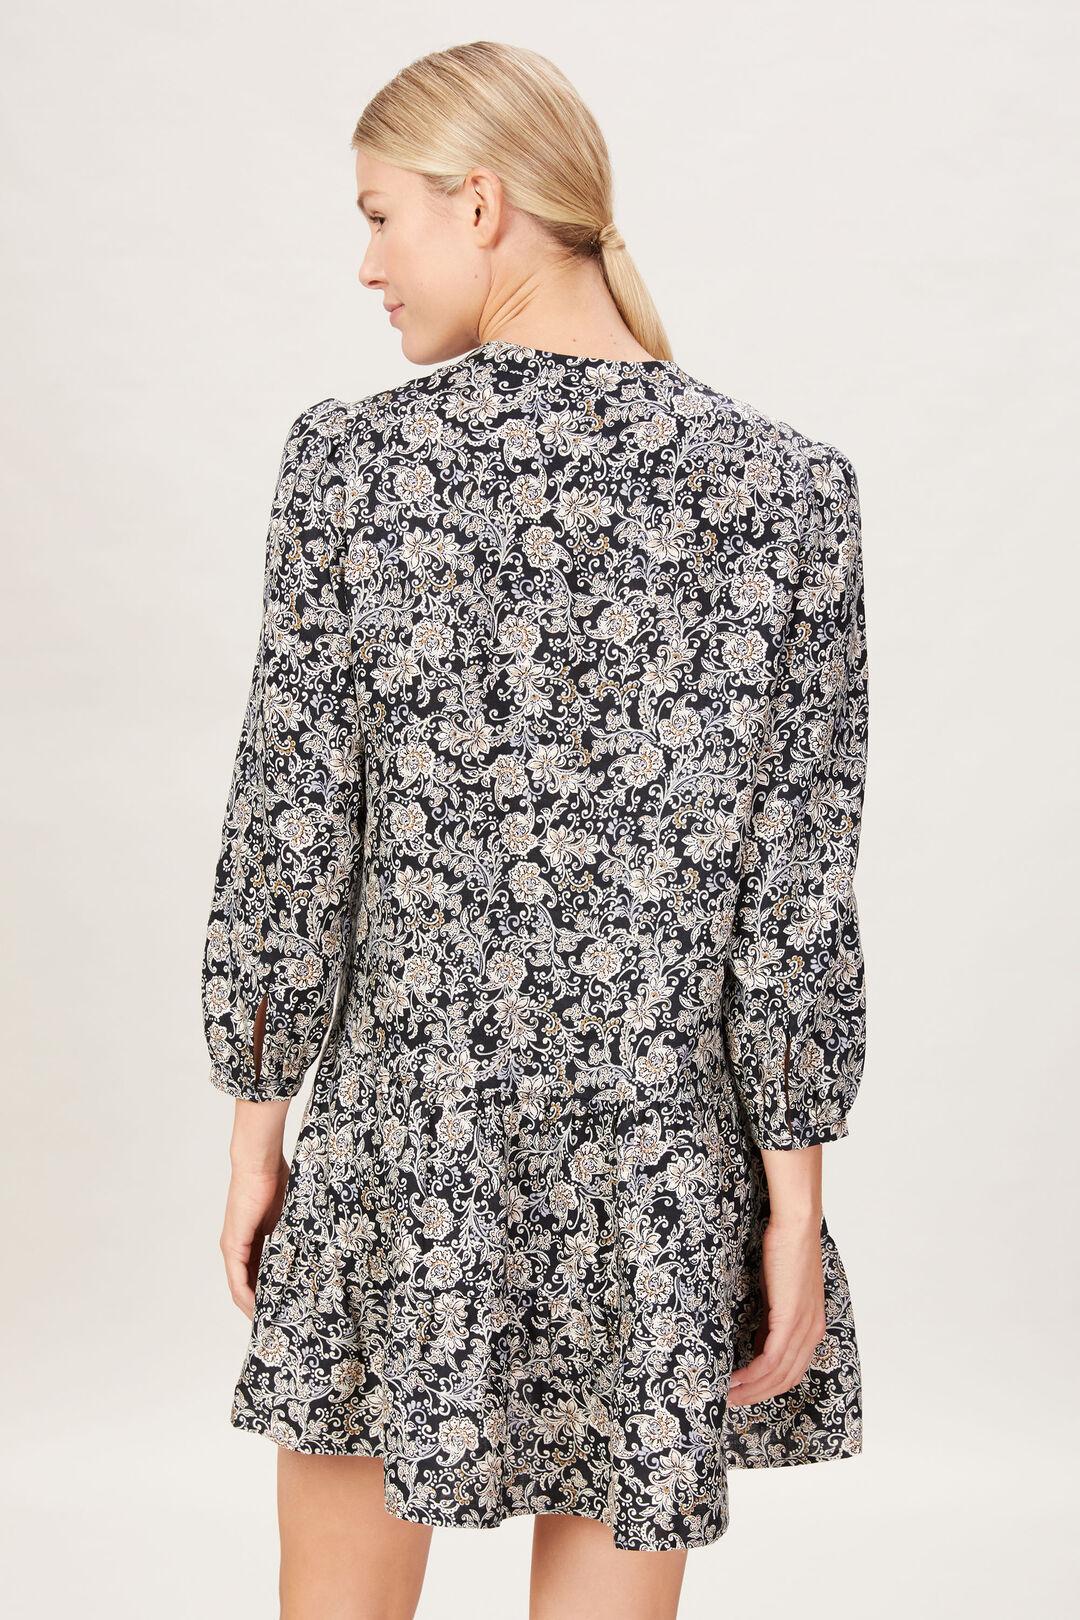 FRENCH LINEN V-NECK DRESS  MULTI  hi-res